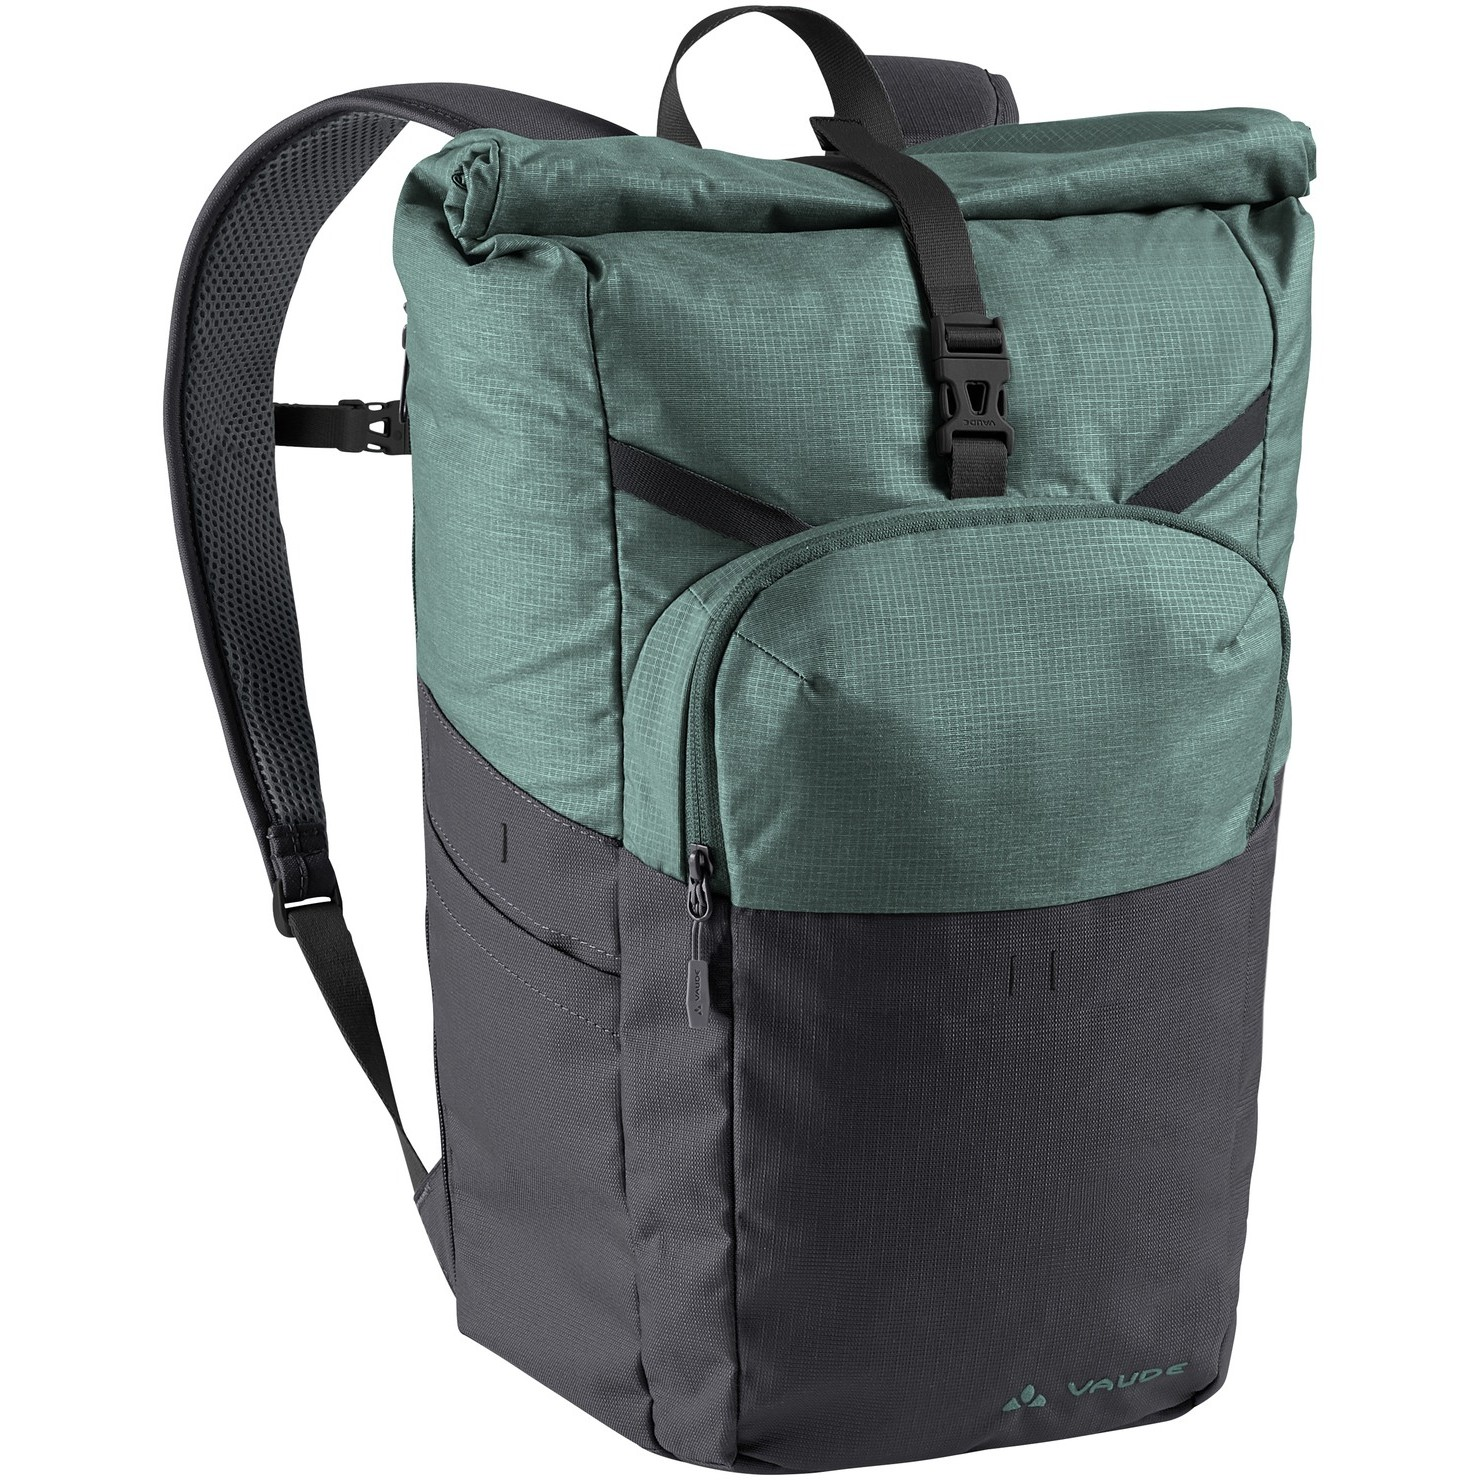 Vaude Okab Backpack - black/dusty forest